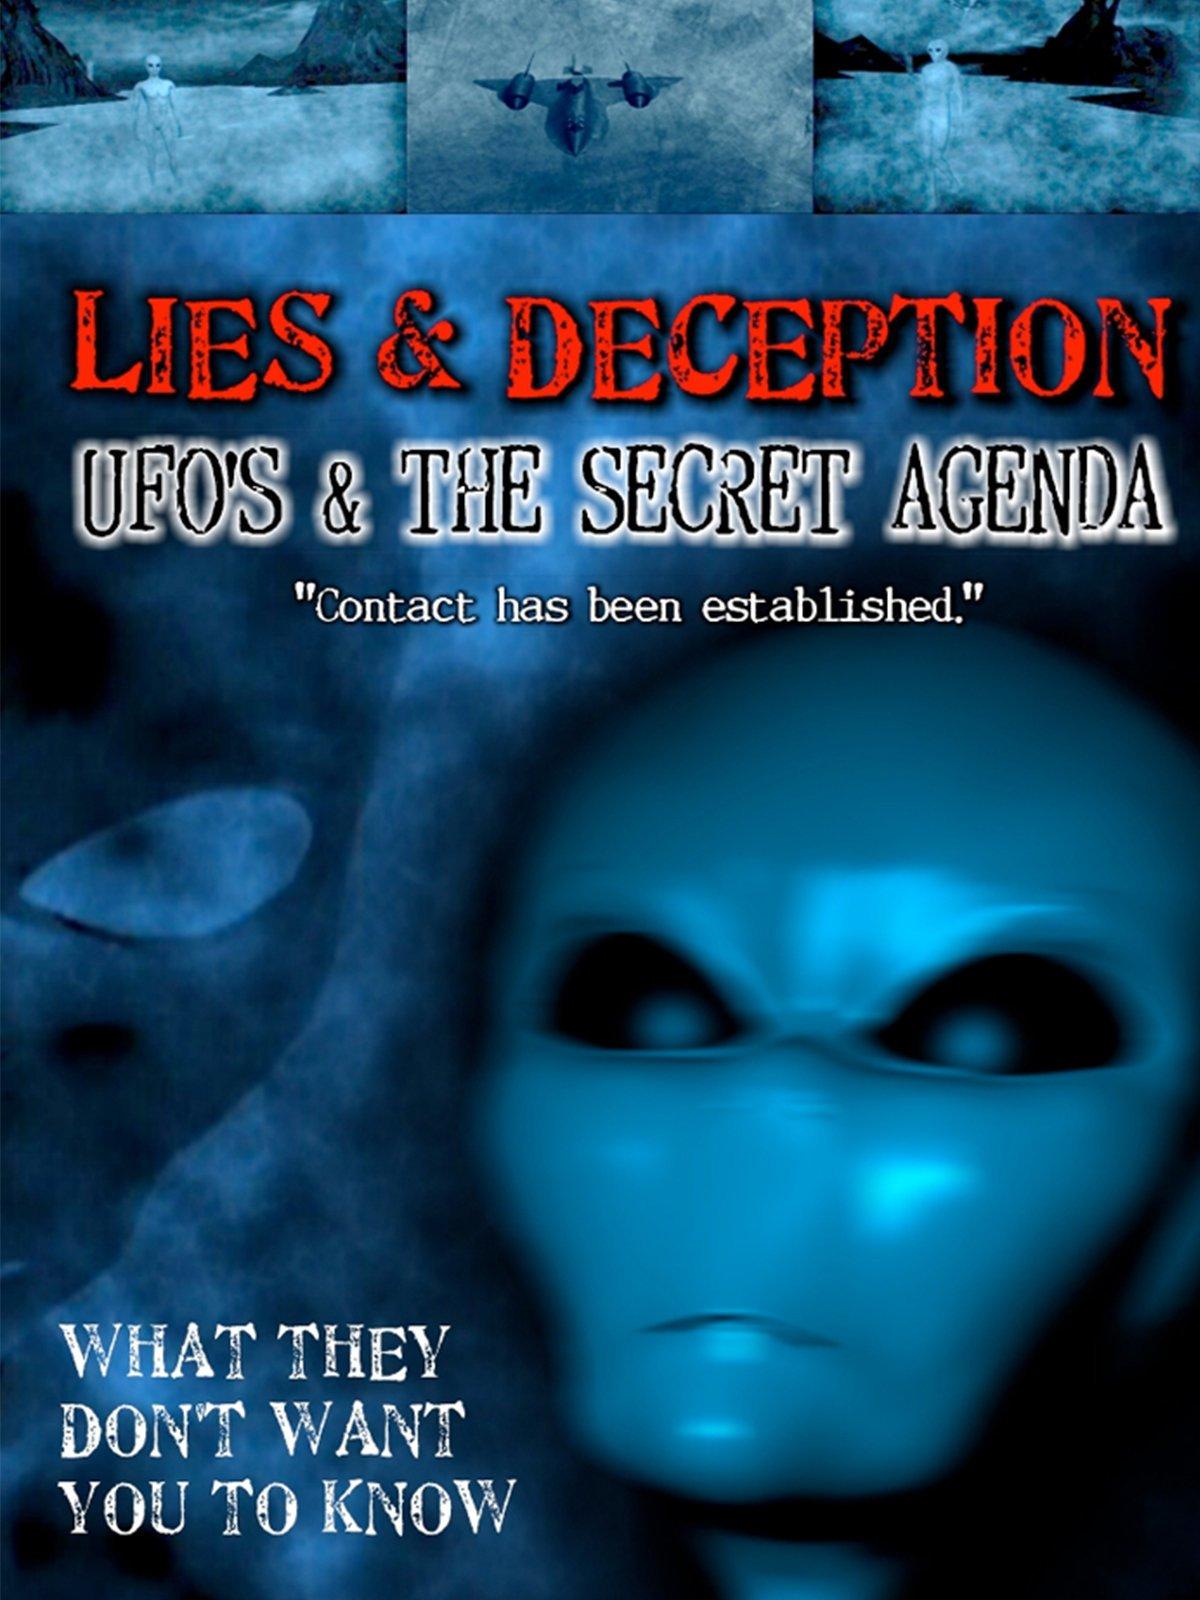 Lies & Deception UFO's & the Secret Agenda on Amazon Prime Video UK